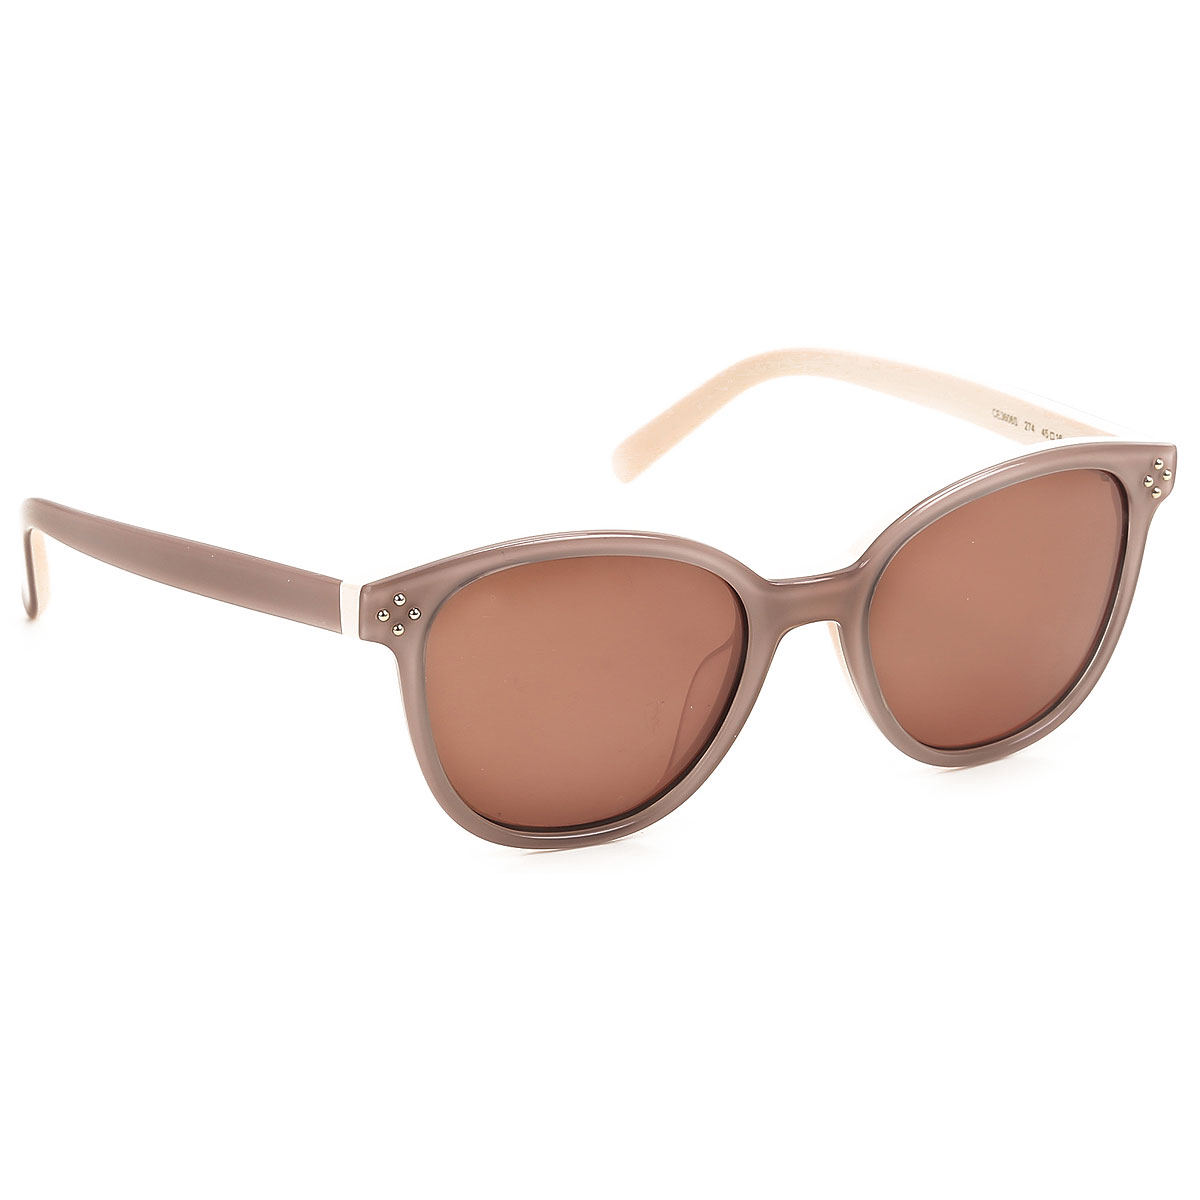 Image of Chloe Kids Sunglasses for Girls On Sale, Mauve, 2017